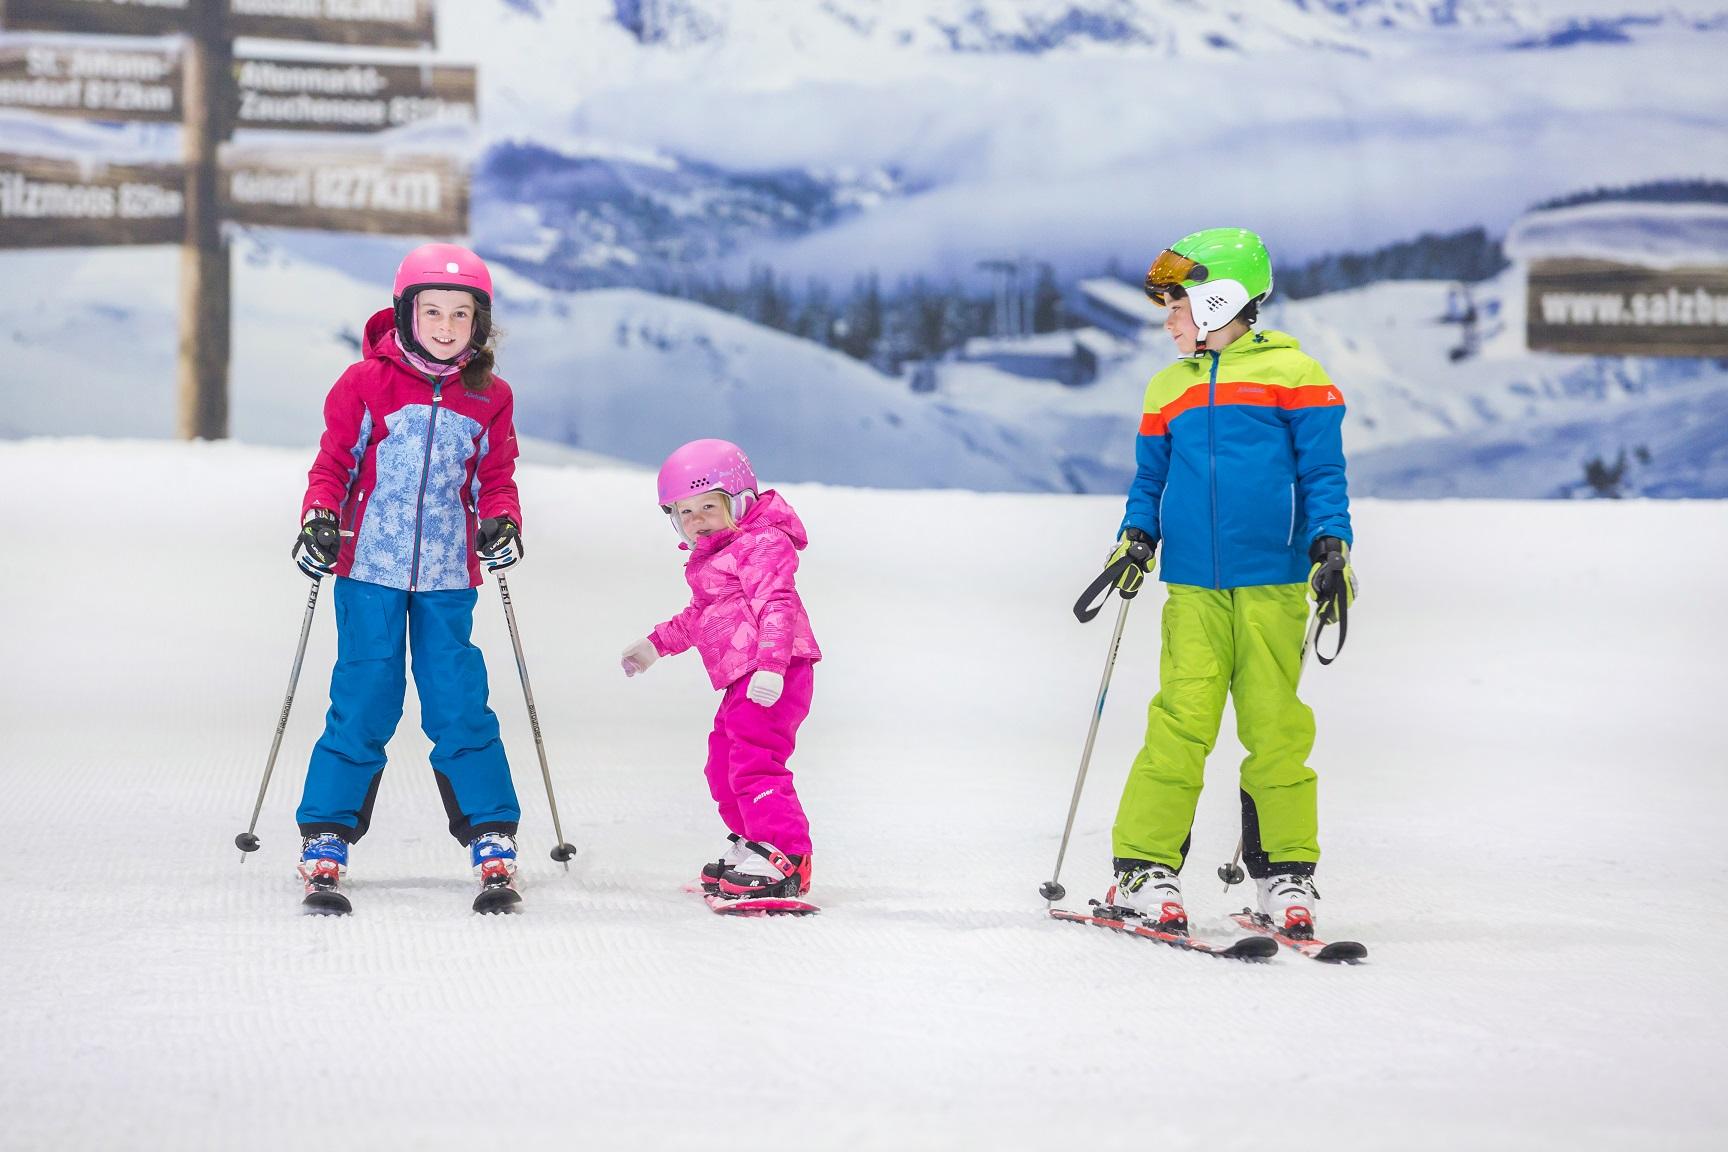 Ausflug Skihalle Neuss mit DriveNow Carsharing